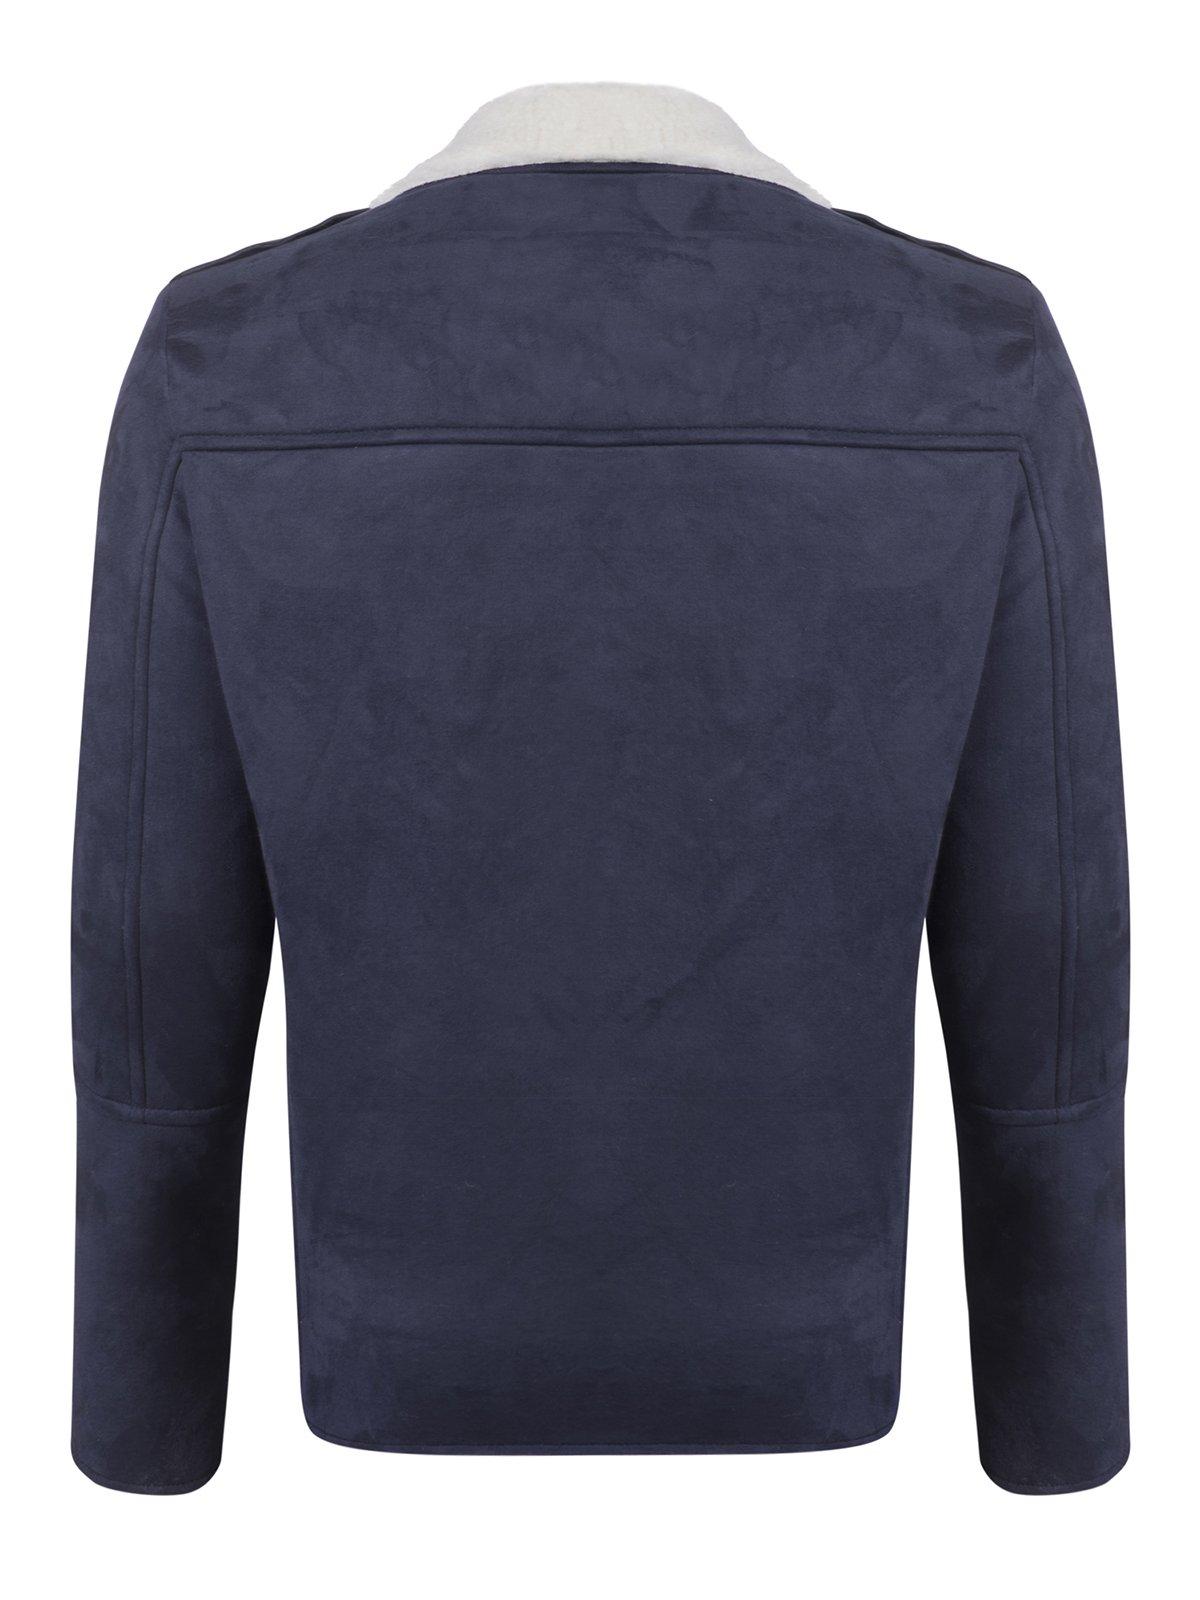 Куртка темно-синяя | 3594269 | фото 4